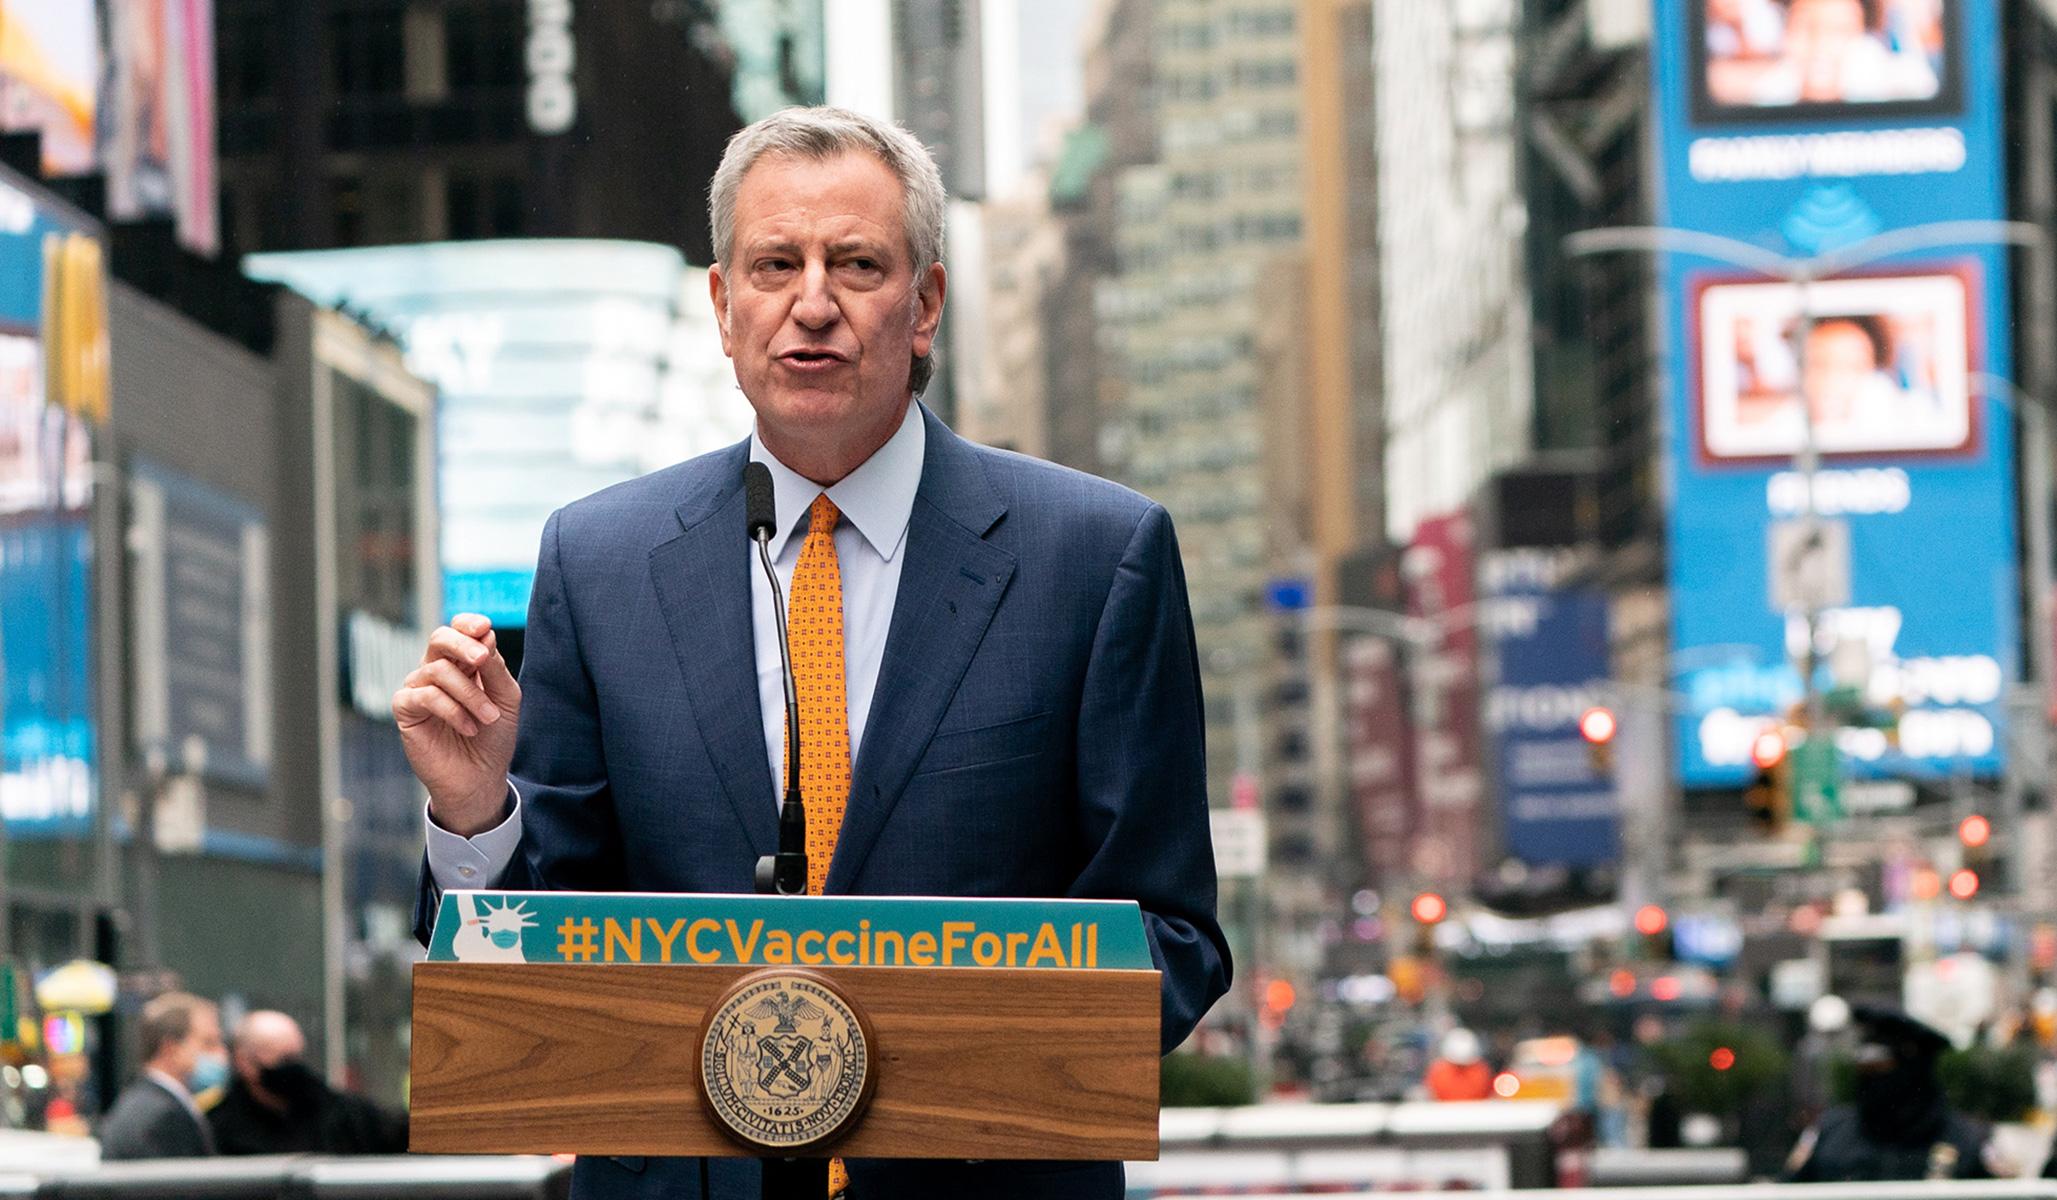 New York City to Require Proof of Vaccination for Indoor Activities